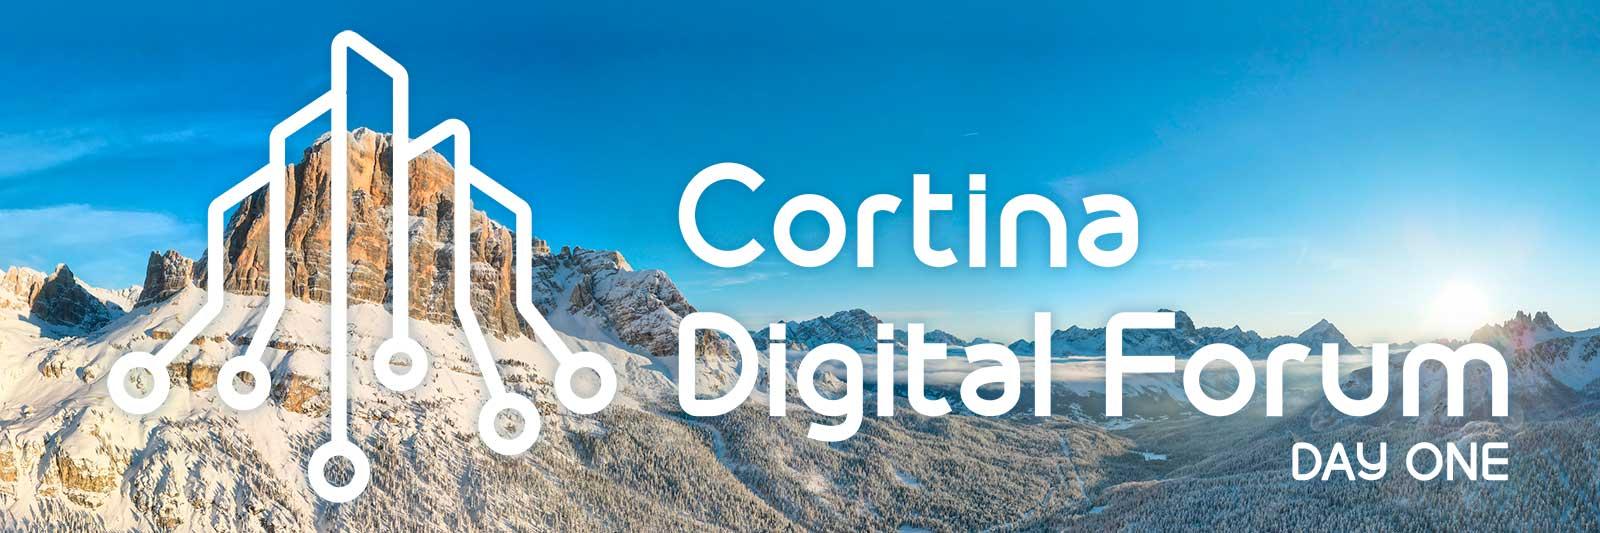 Cortina Digital Forum 2021 - day one